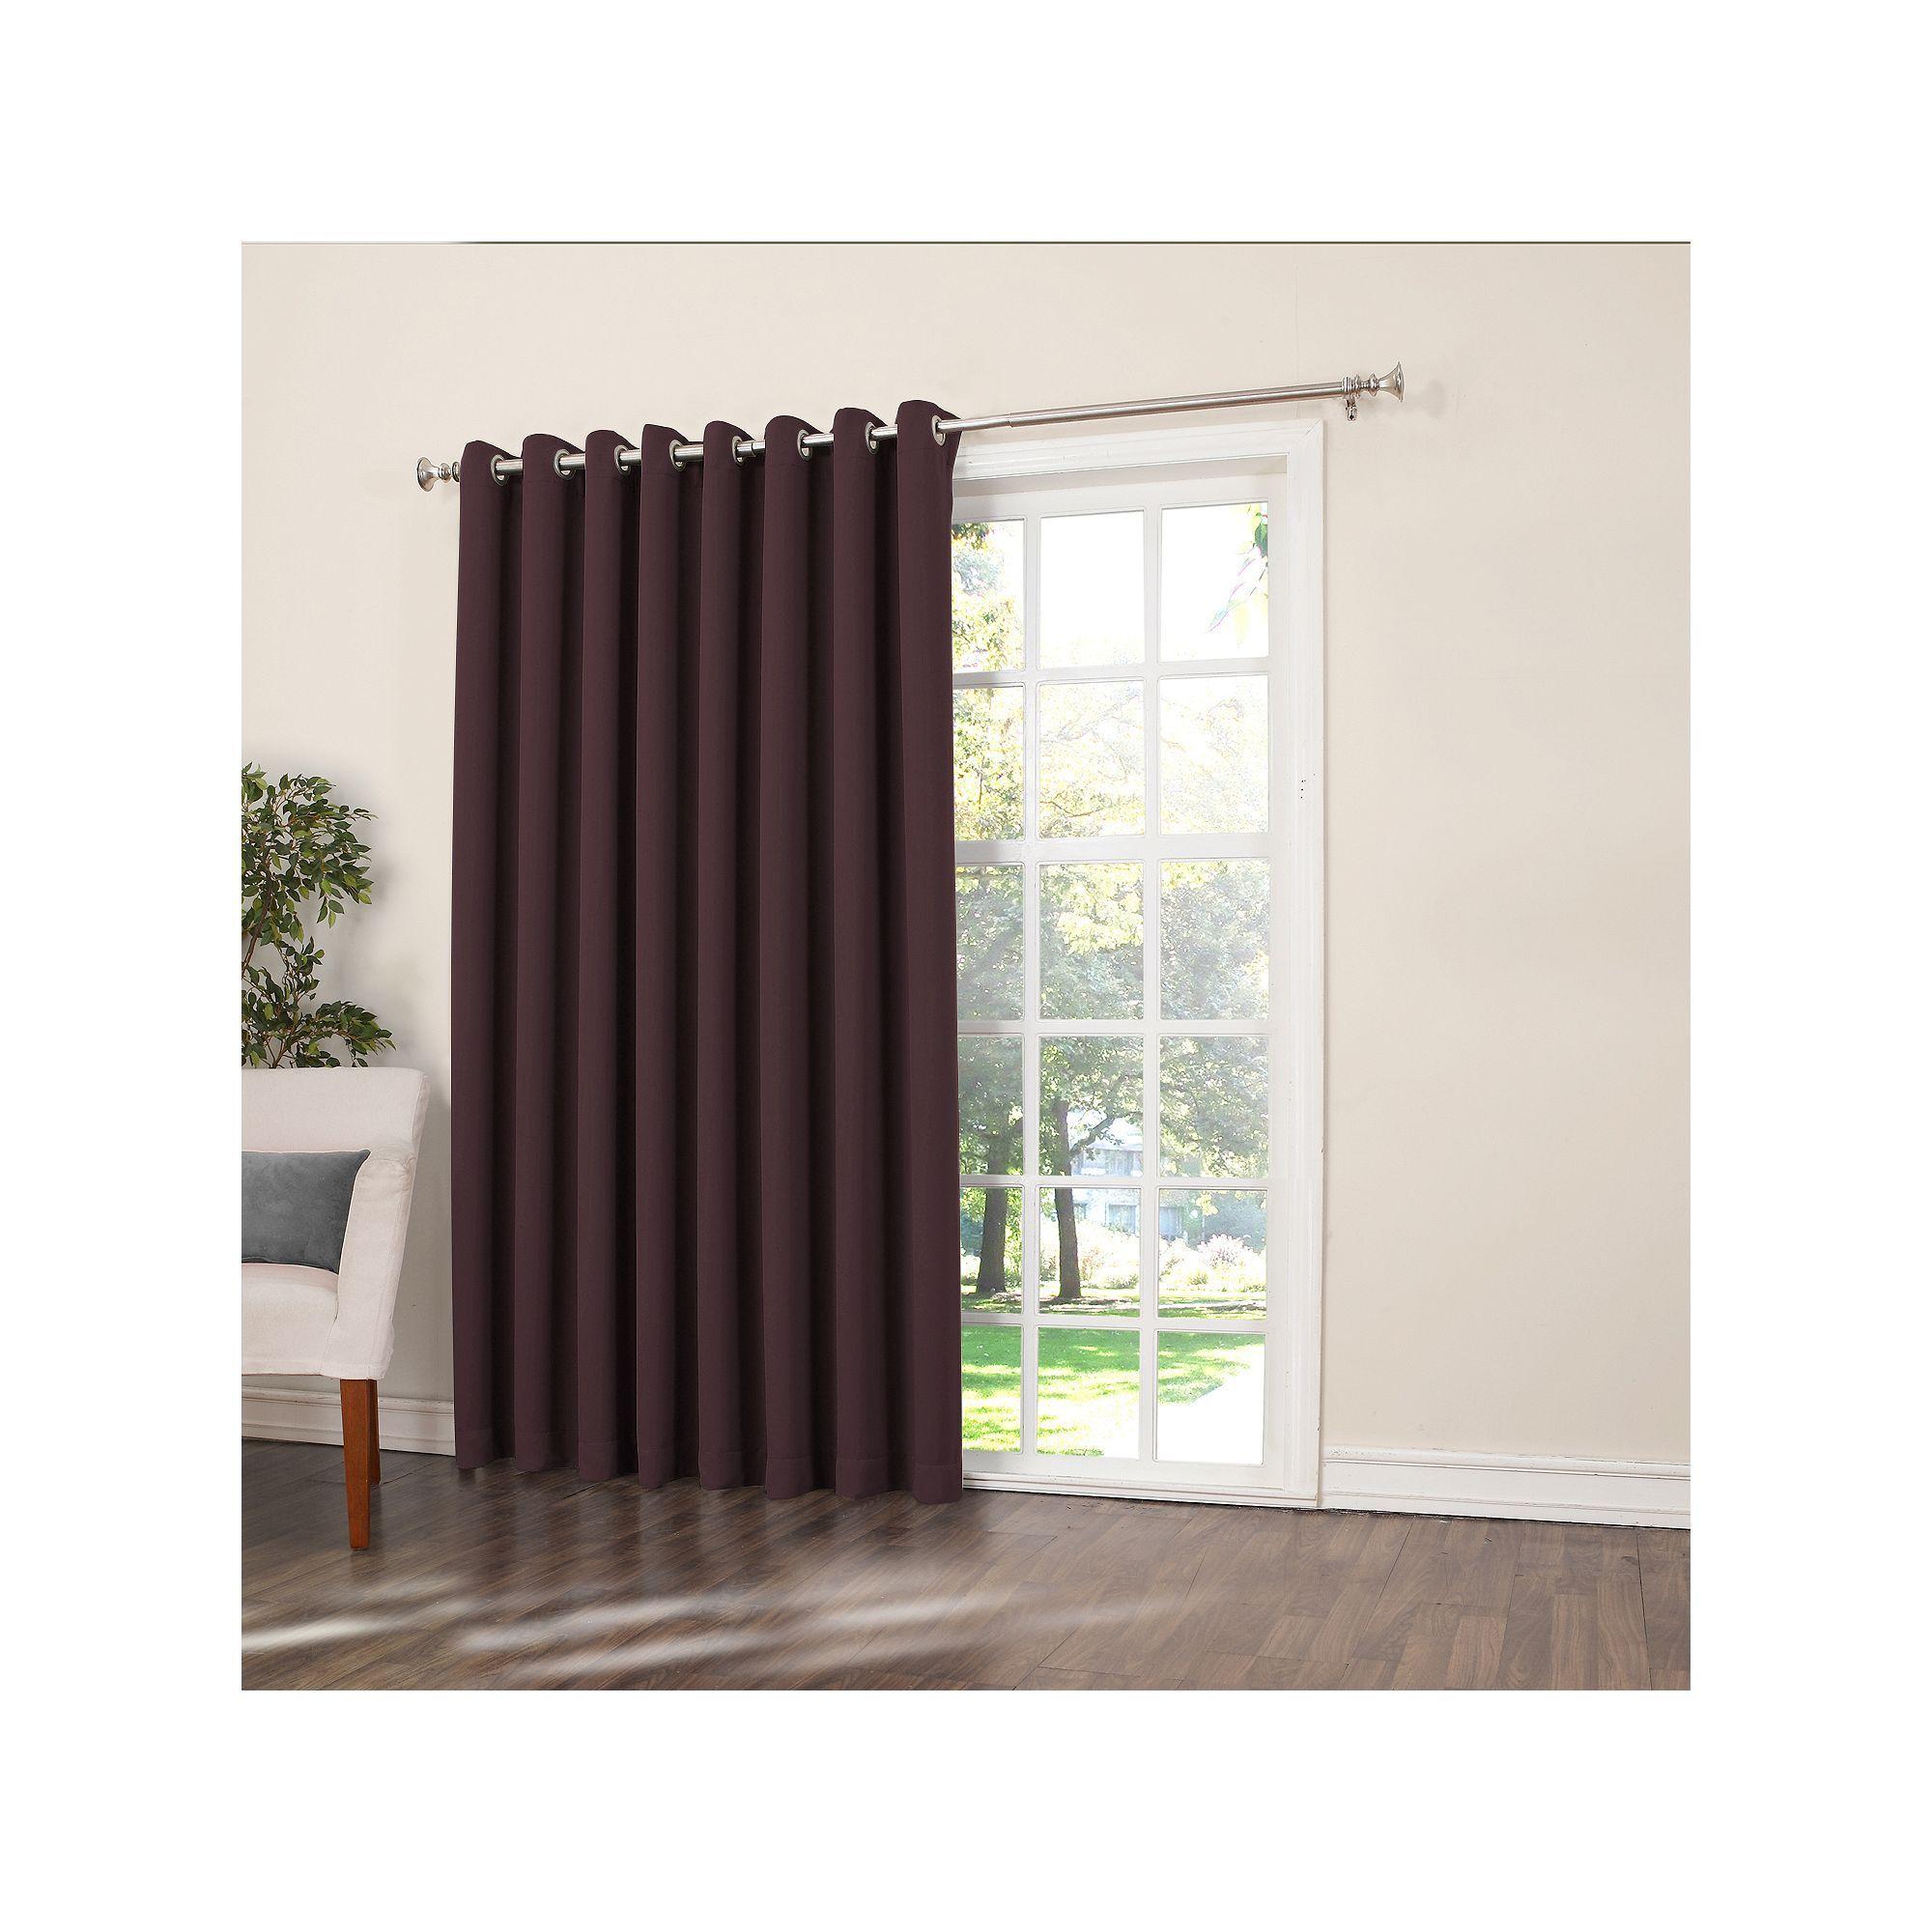 Home window patio door curtain panels grand pointe room darkening - Sun Zero Gramercy Room Darkening Patio Door Window Panel 100 X 84 Blue